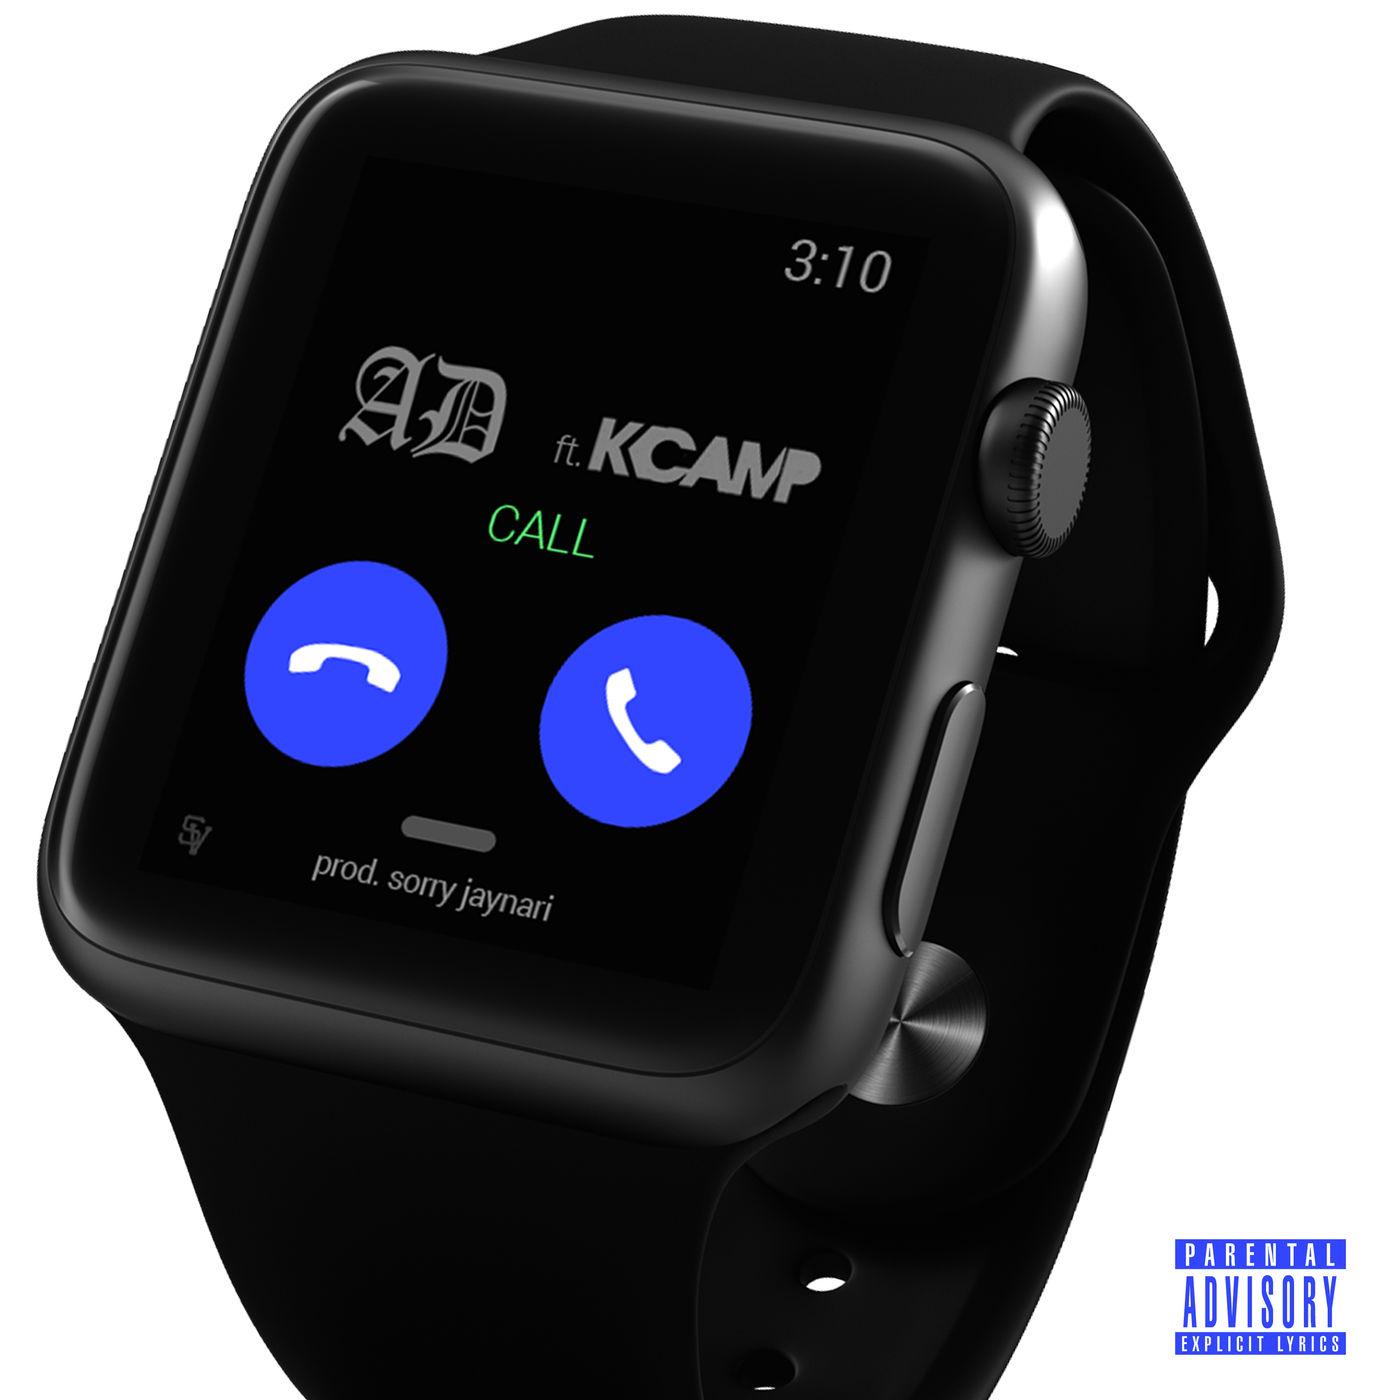 AD & Sorry Jaynari - Call (feat. K CAMP) - Single   Cover